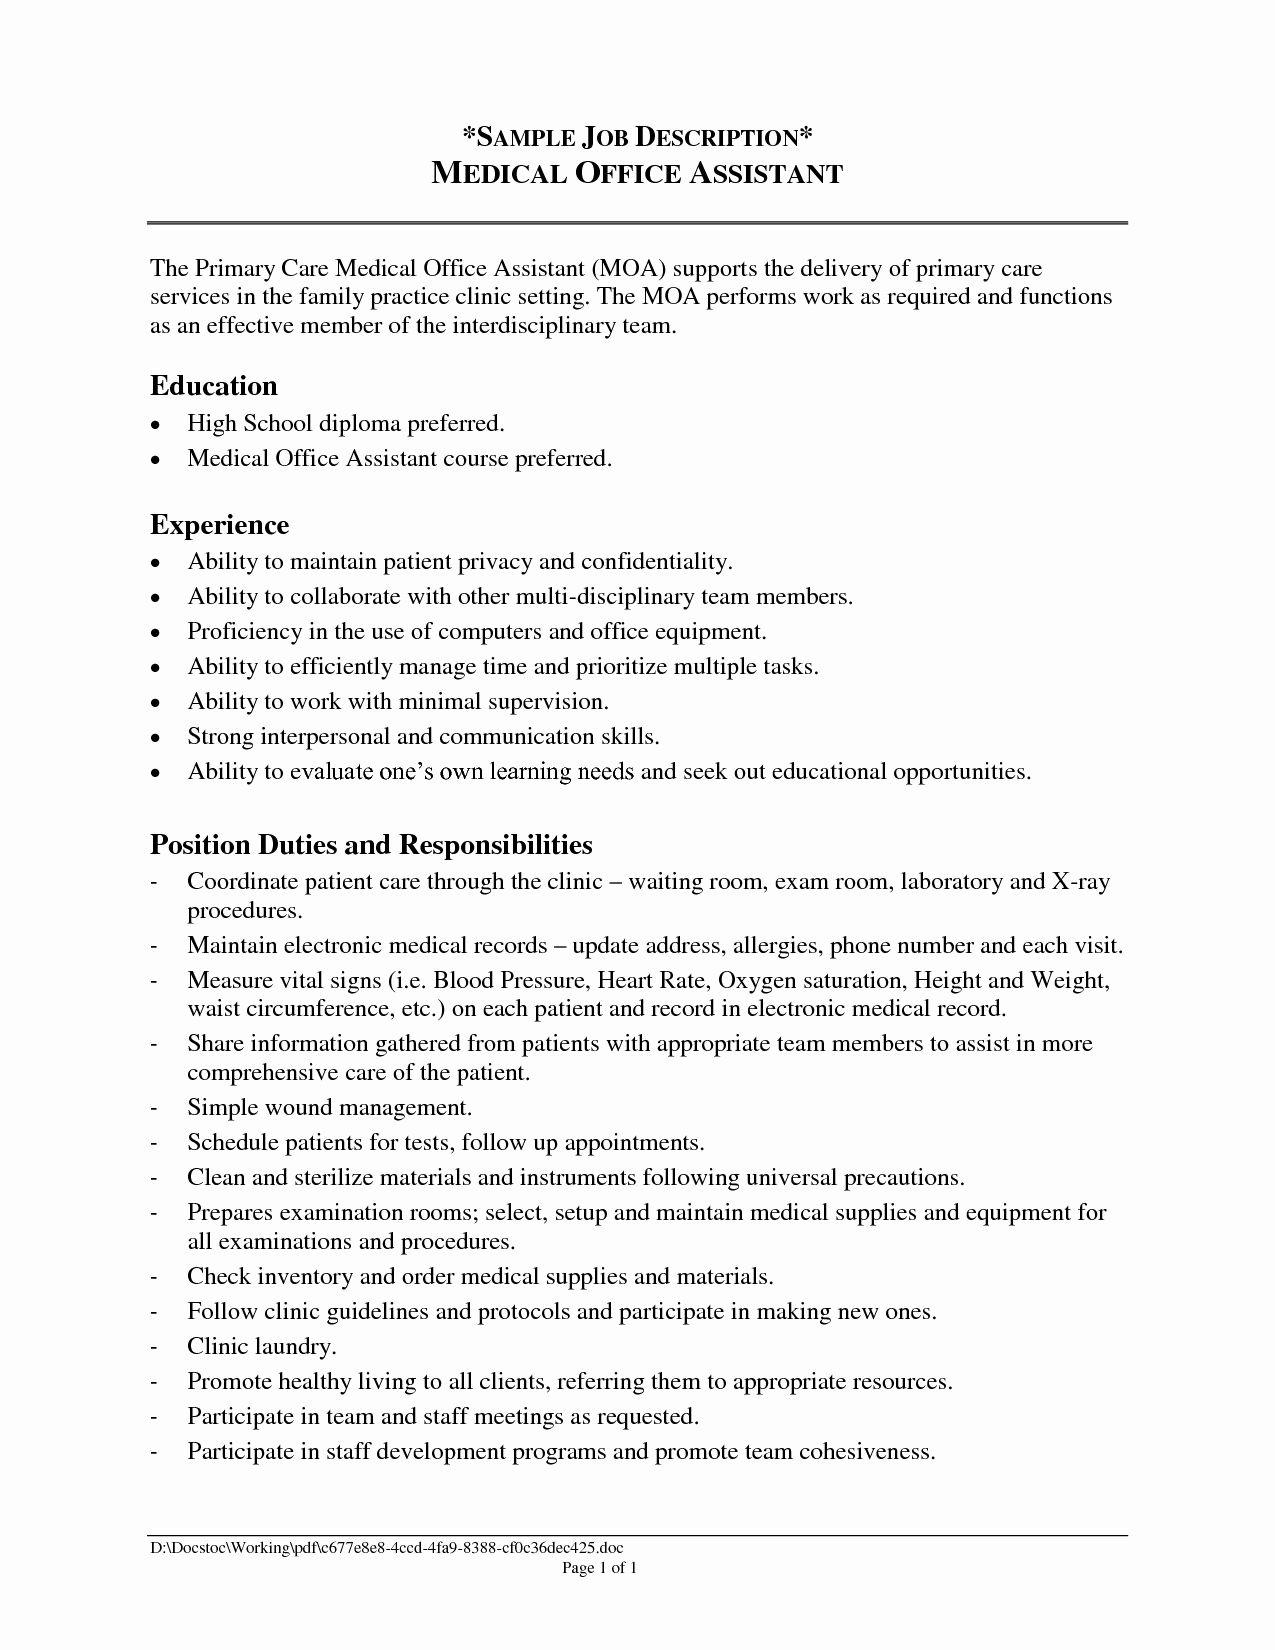 20 hr assistant job description resume in 2020 medical template office 365 sample format 2018 simple curriculum vitae